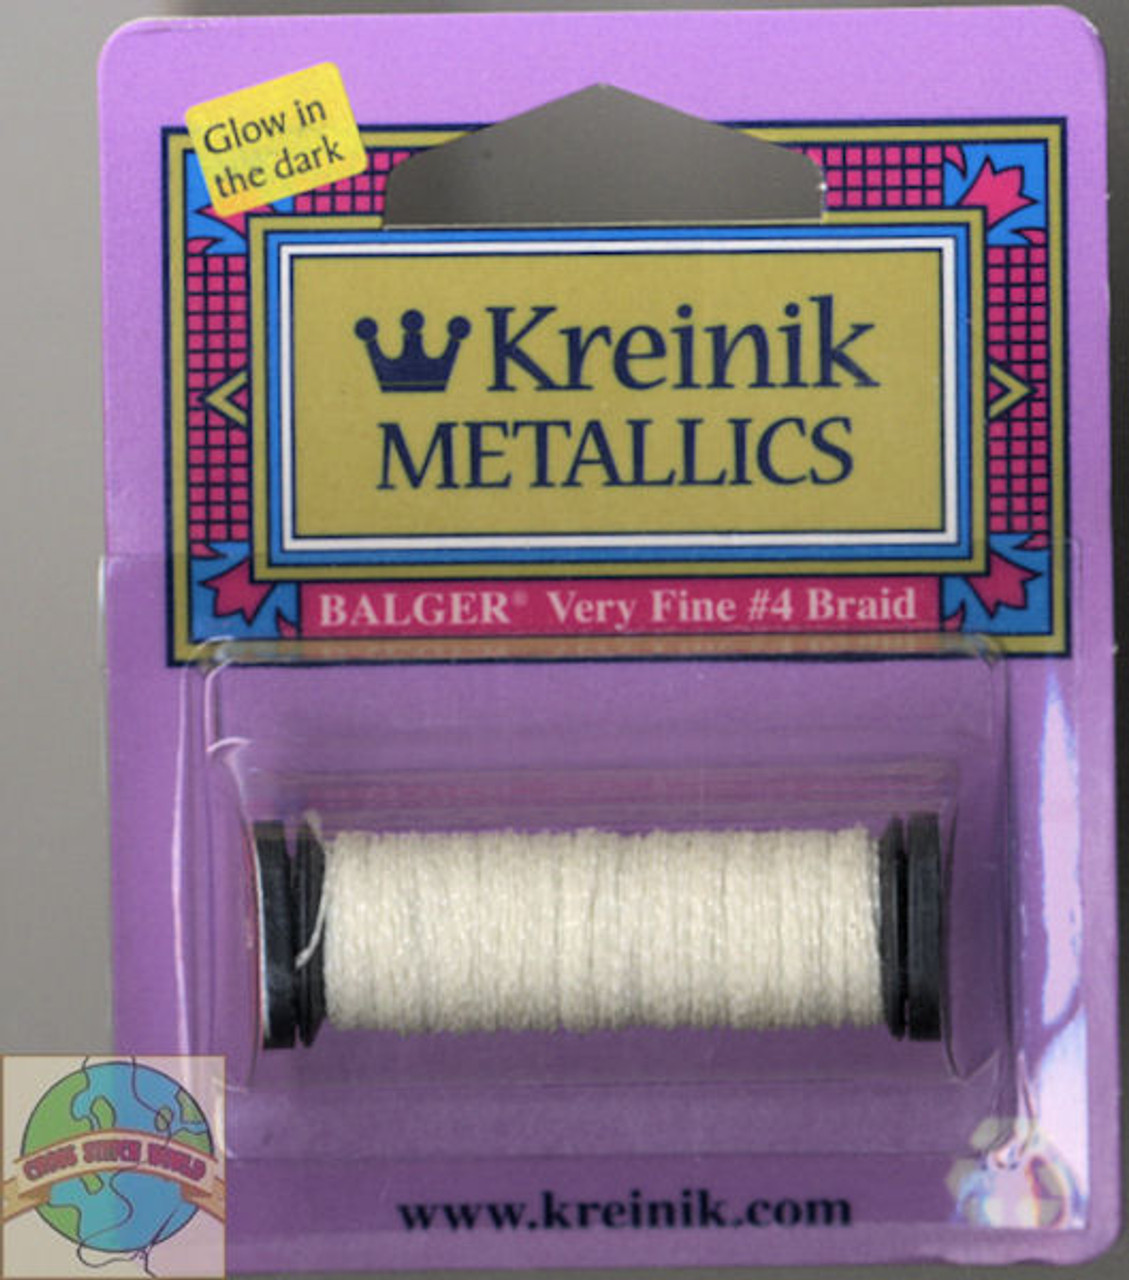 Kreinik Metallics - Very Fine #4 Grapefruit 052F